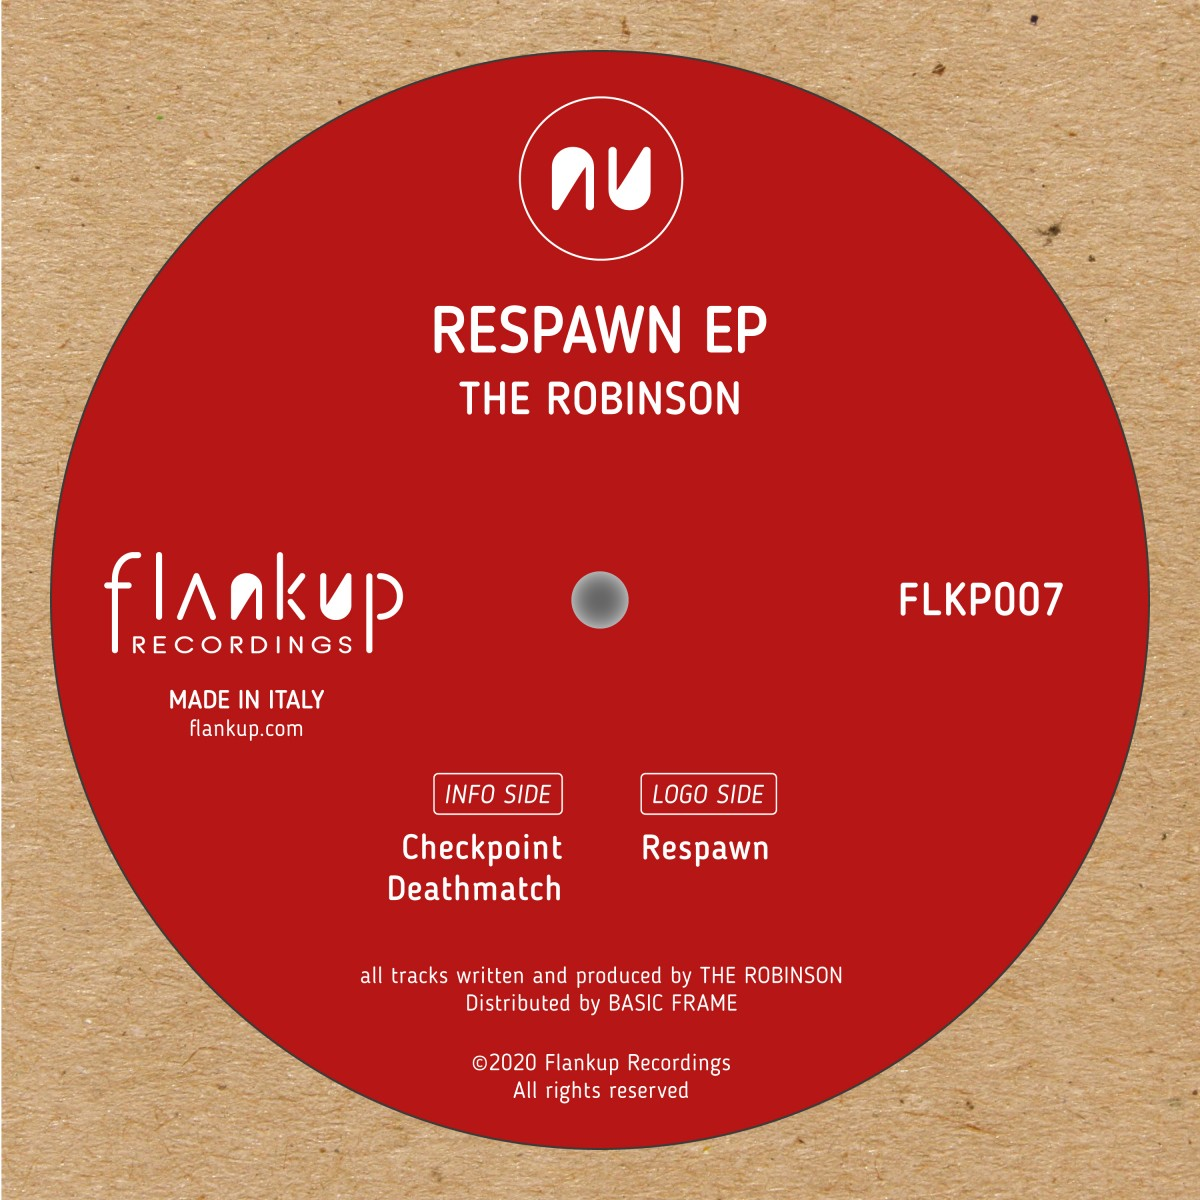 The Robinson - Respawn